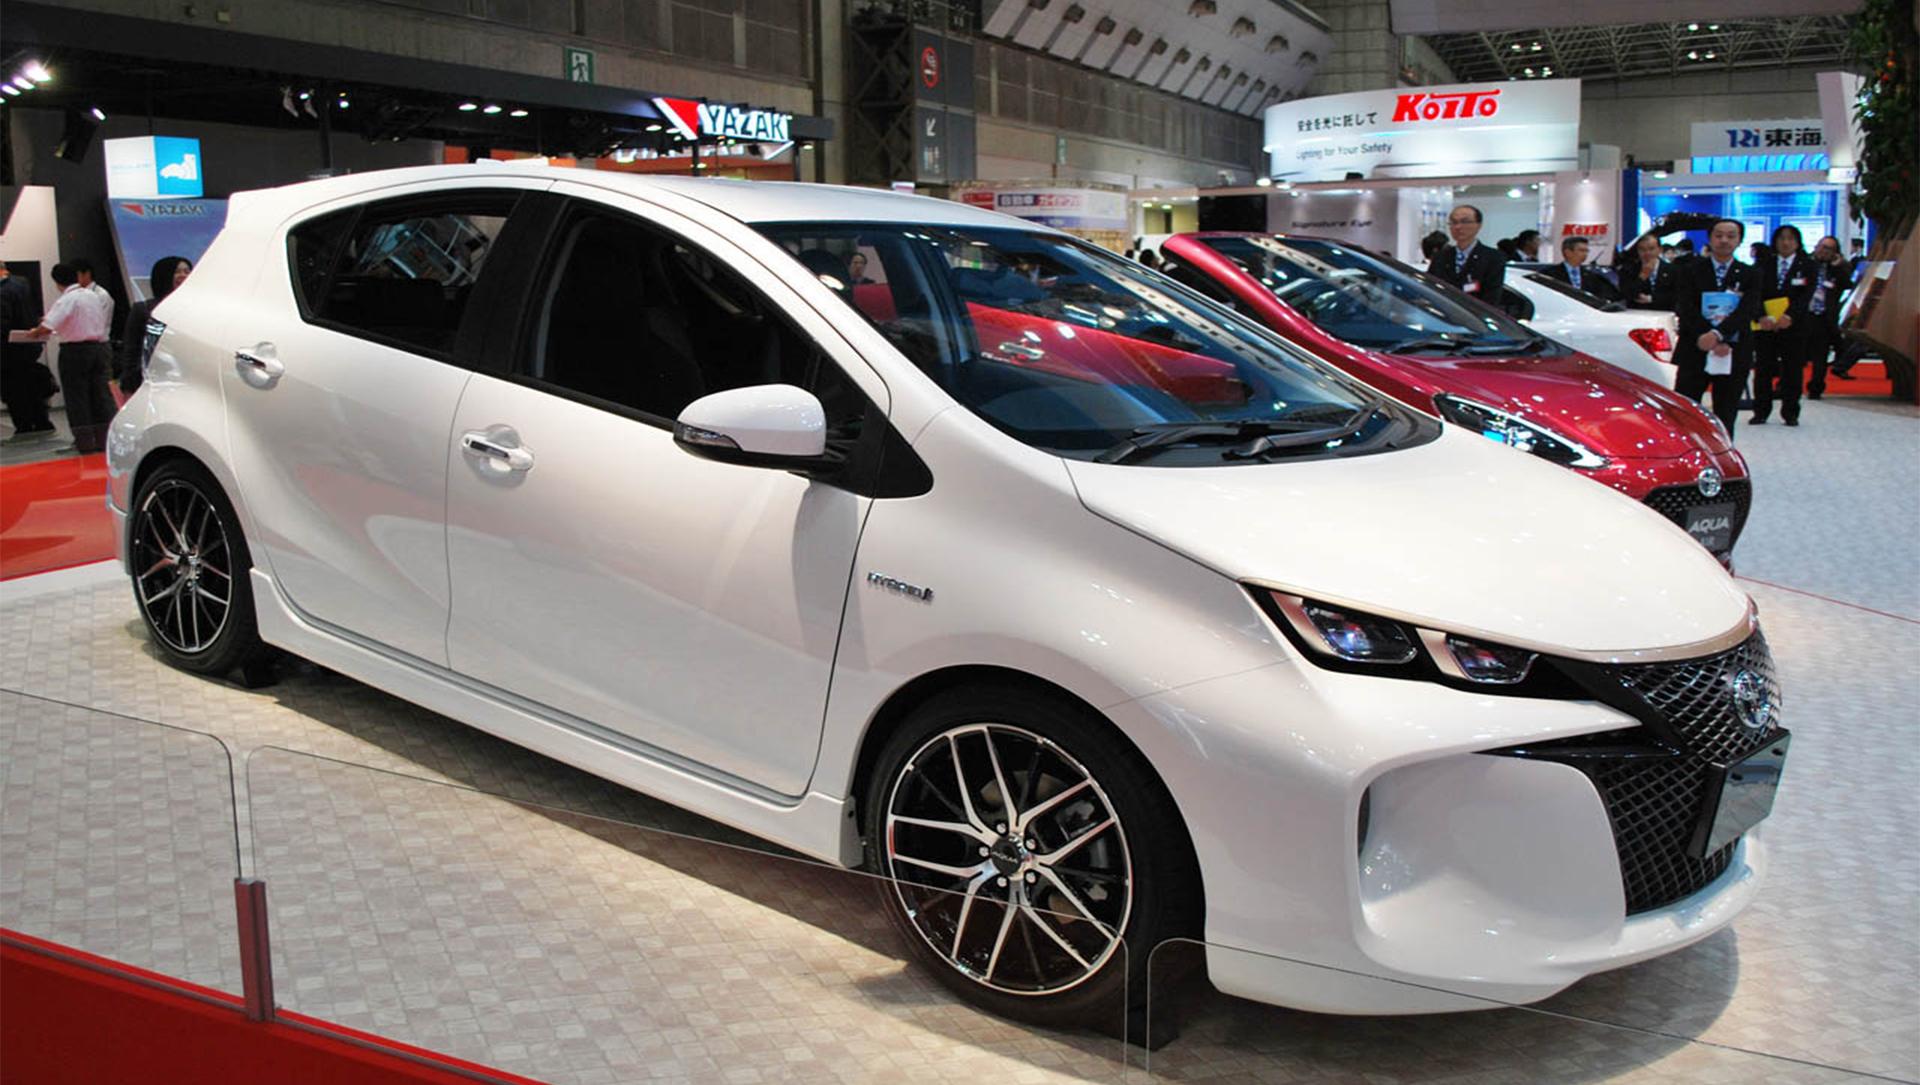 Toyota Auris Diesel 2016 >> Toyota Prius ibrida caratteristiche